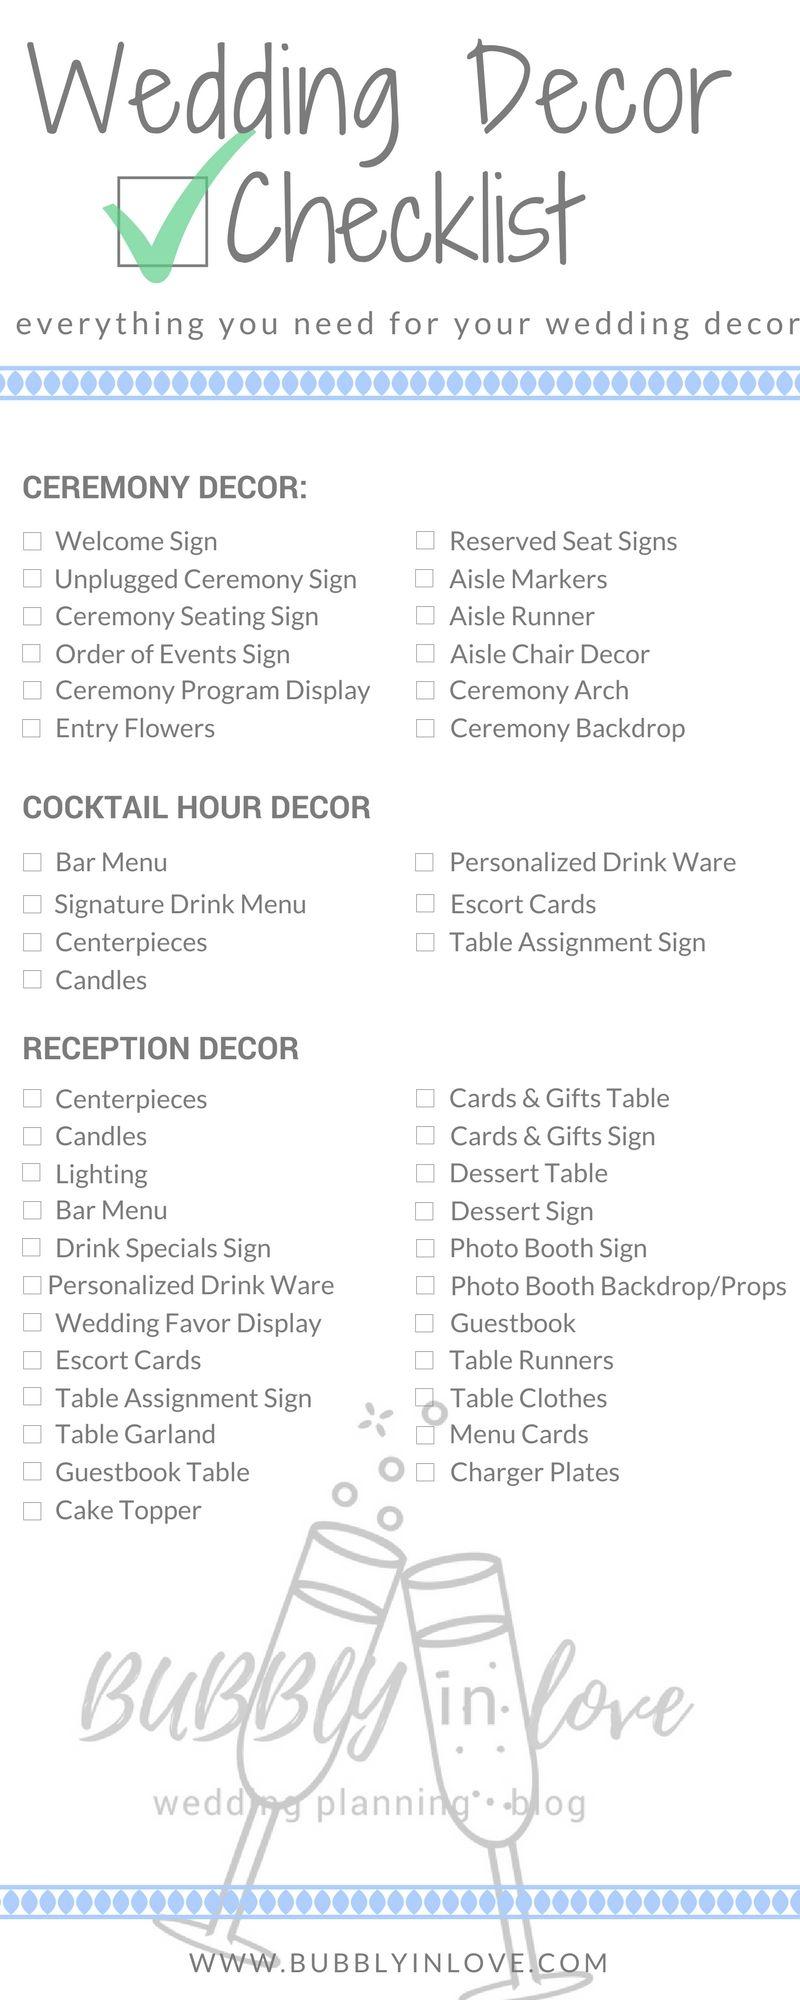 Wedding decorations list  Wedding Decor Checklist u Everything you Need to Plan your Wedding